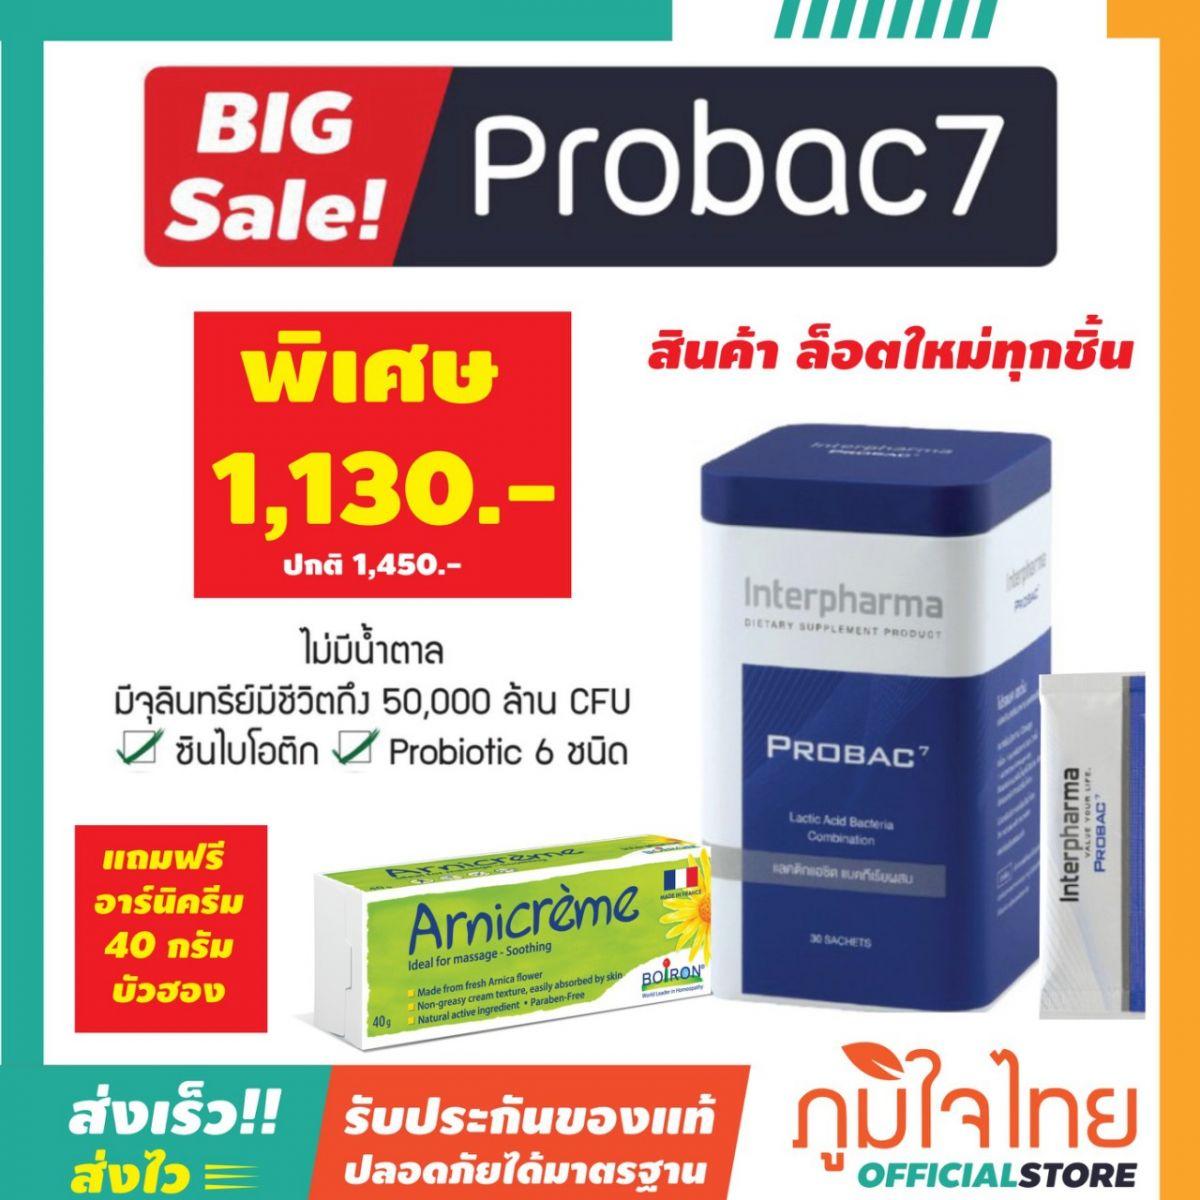 Probac 7 (30ซอง/กล่อง)